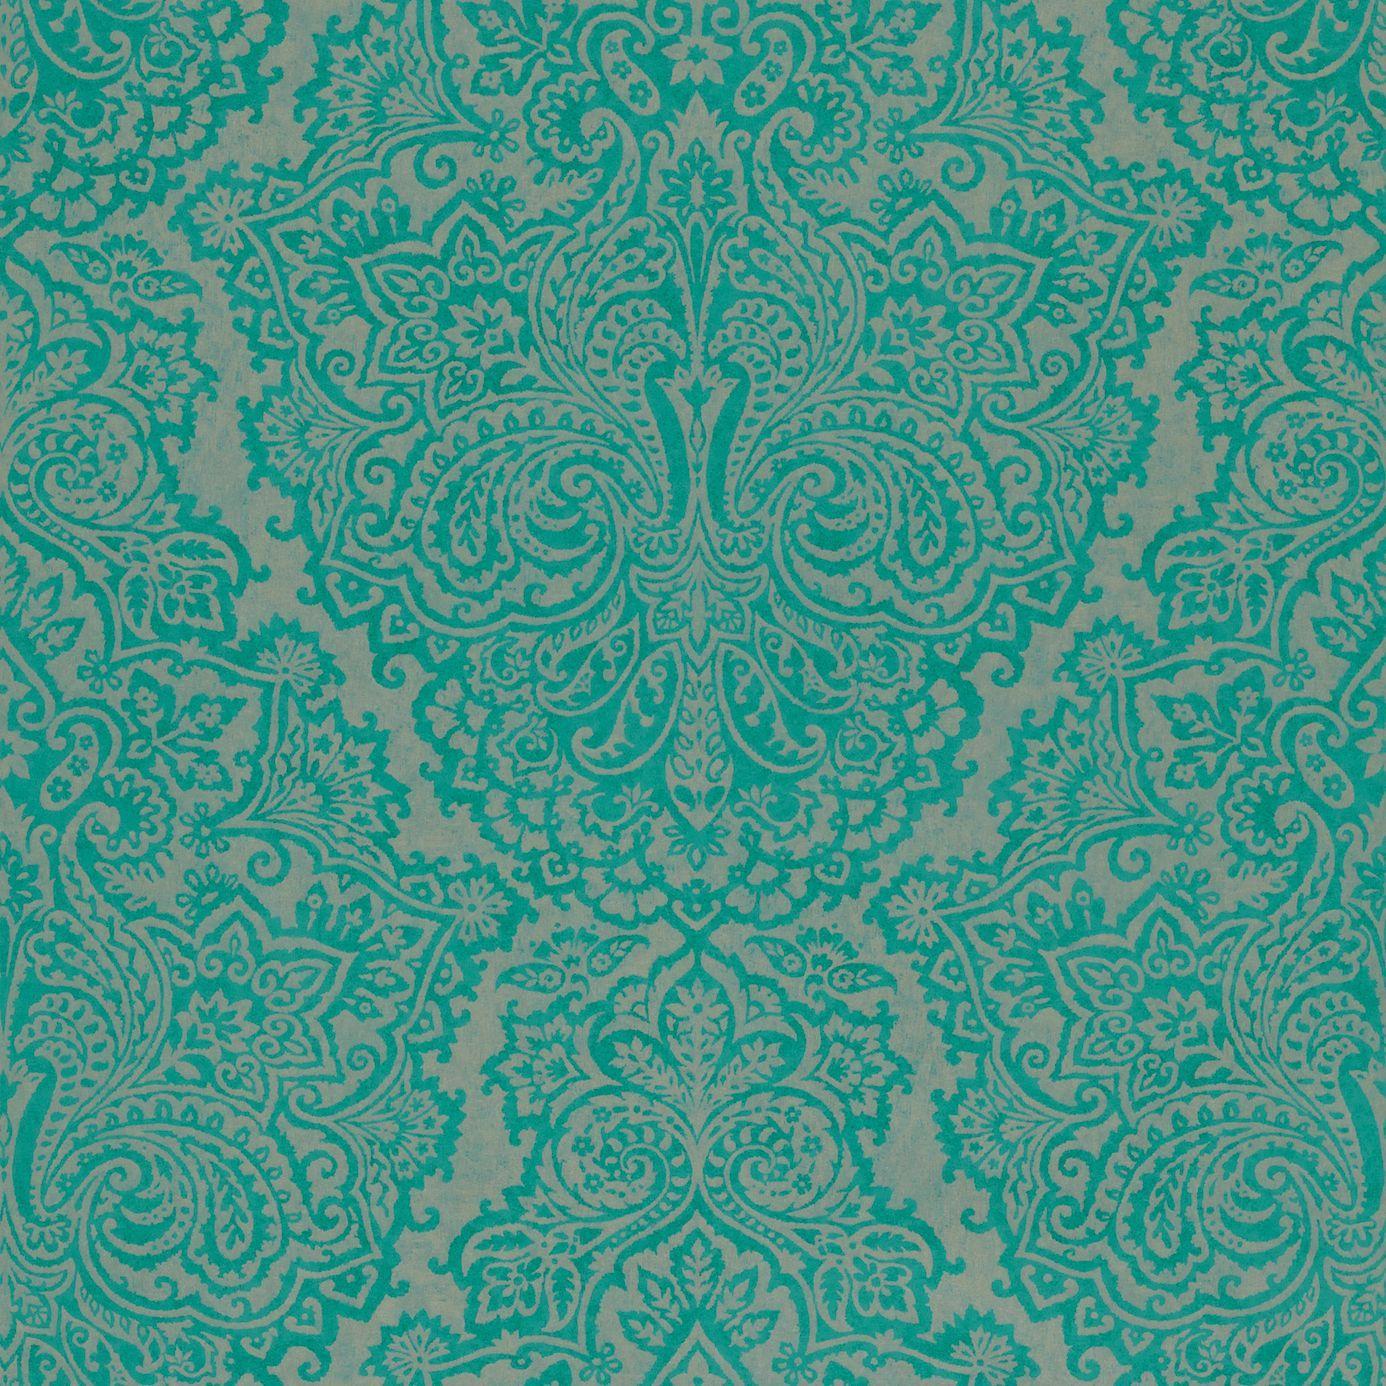 Home Wallpapers Harlequin Lucido Wallpapers Venezia Wallpaper   Gilver 1386x1386